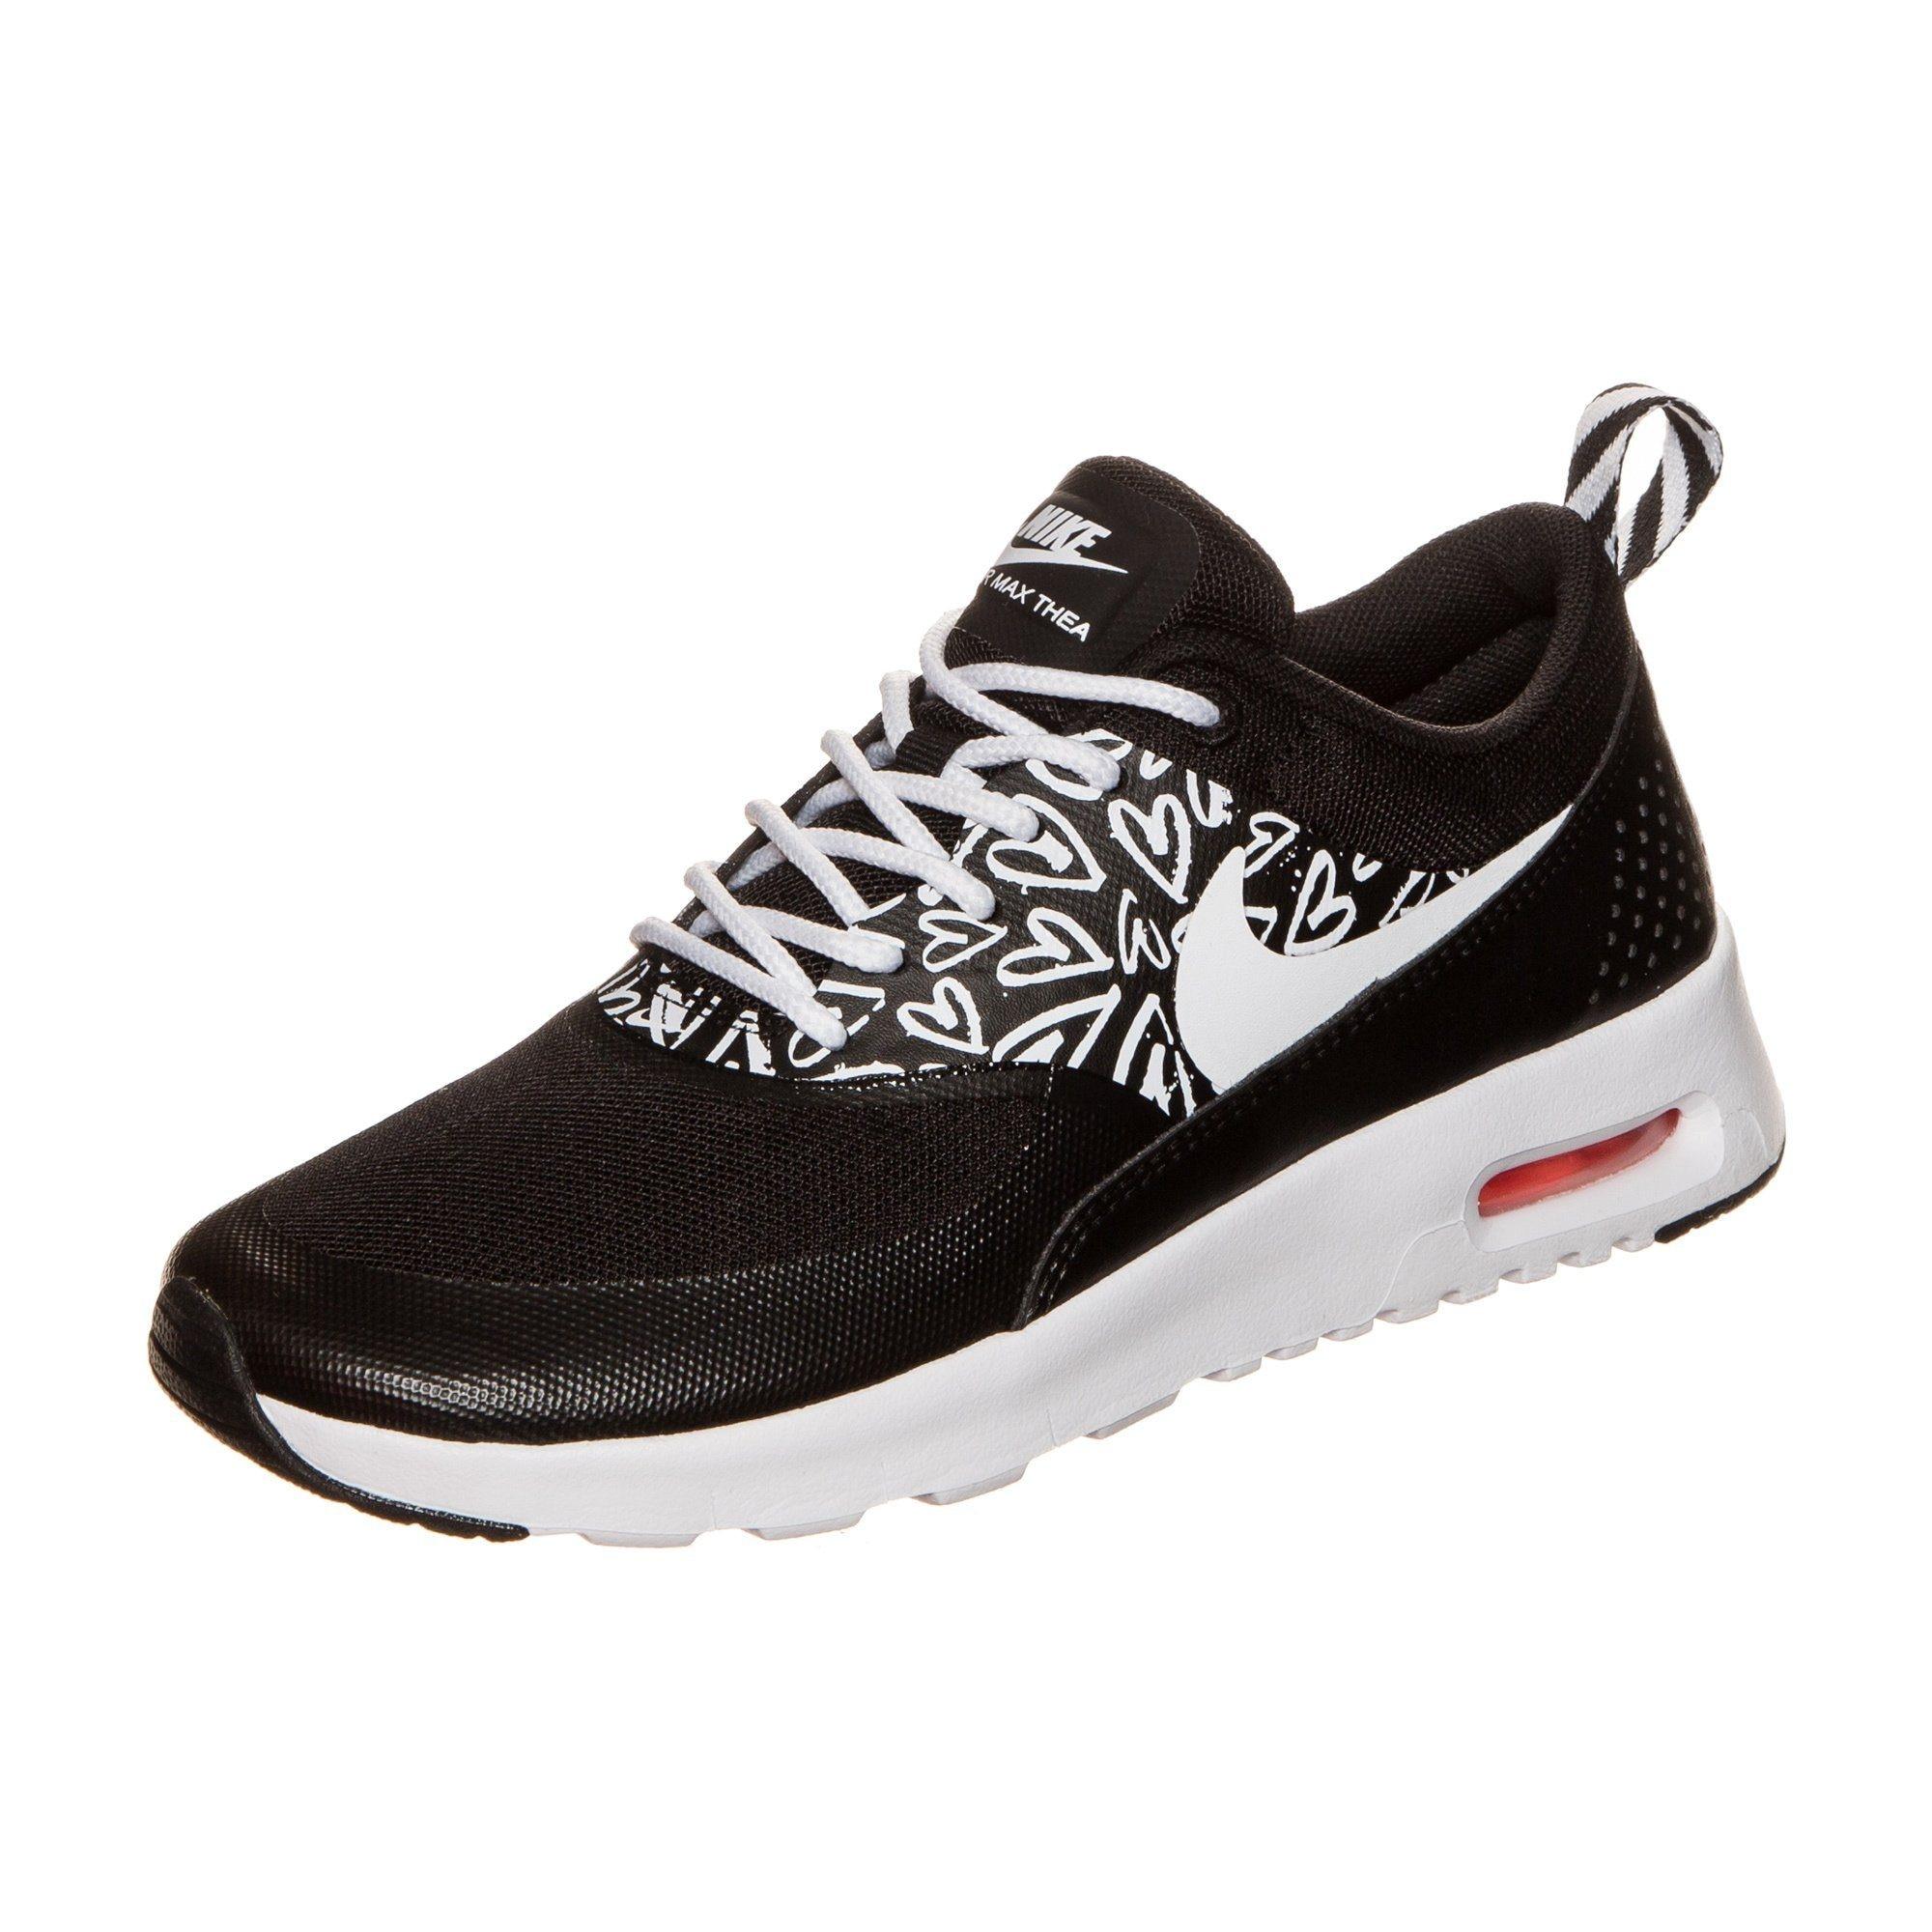 imwalking Kinder Nike Sportswear Air Max Thea Print Sneaker Kinder | 00886912024743